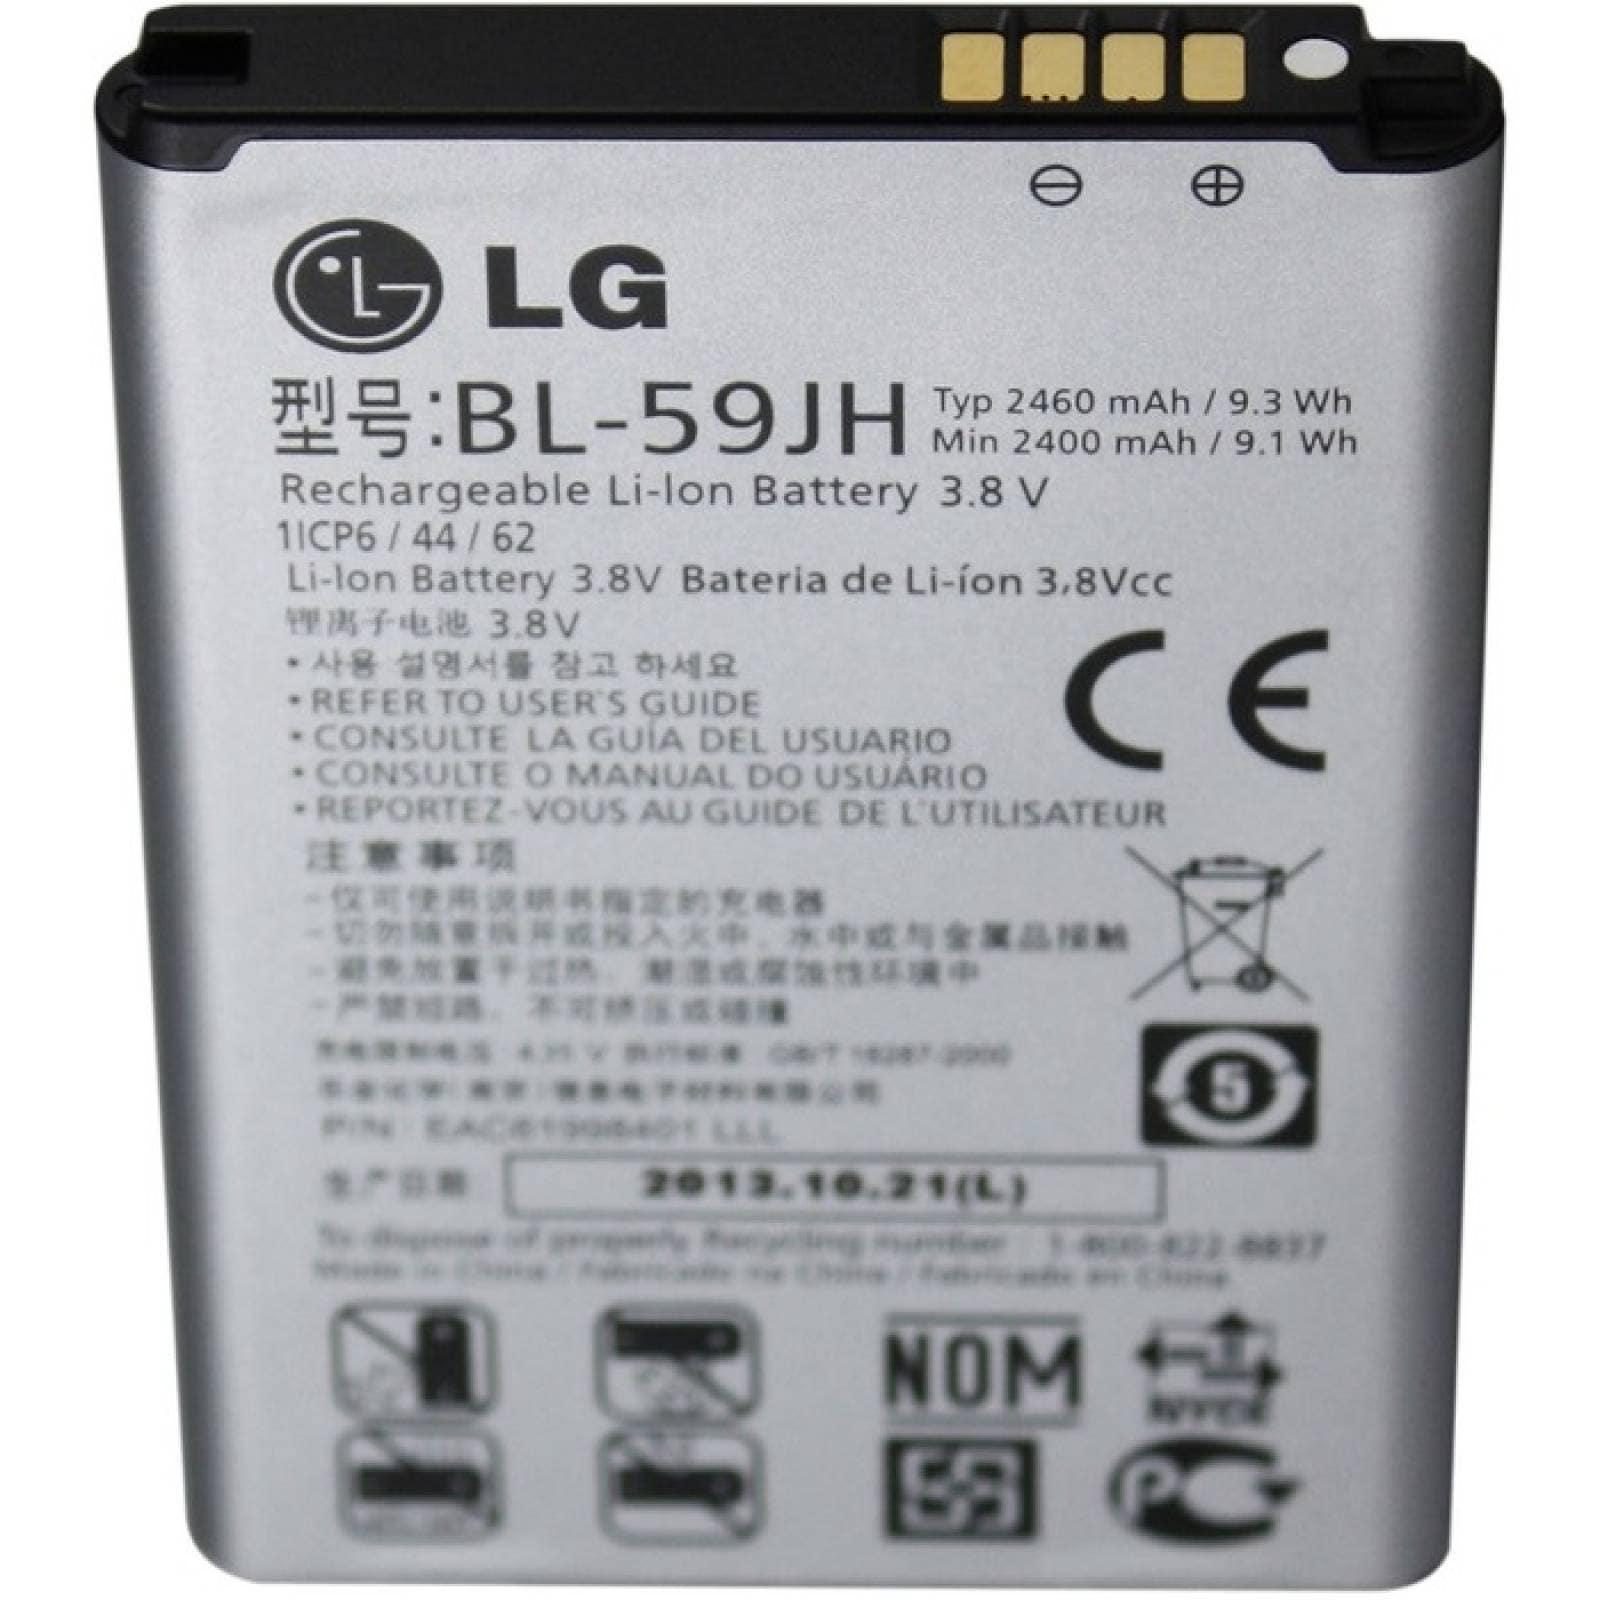 Batera del telfono celular Arclyte